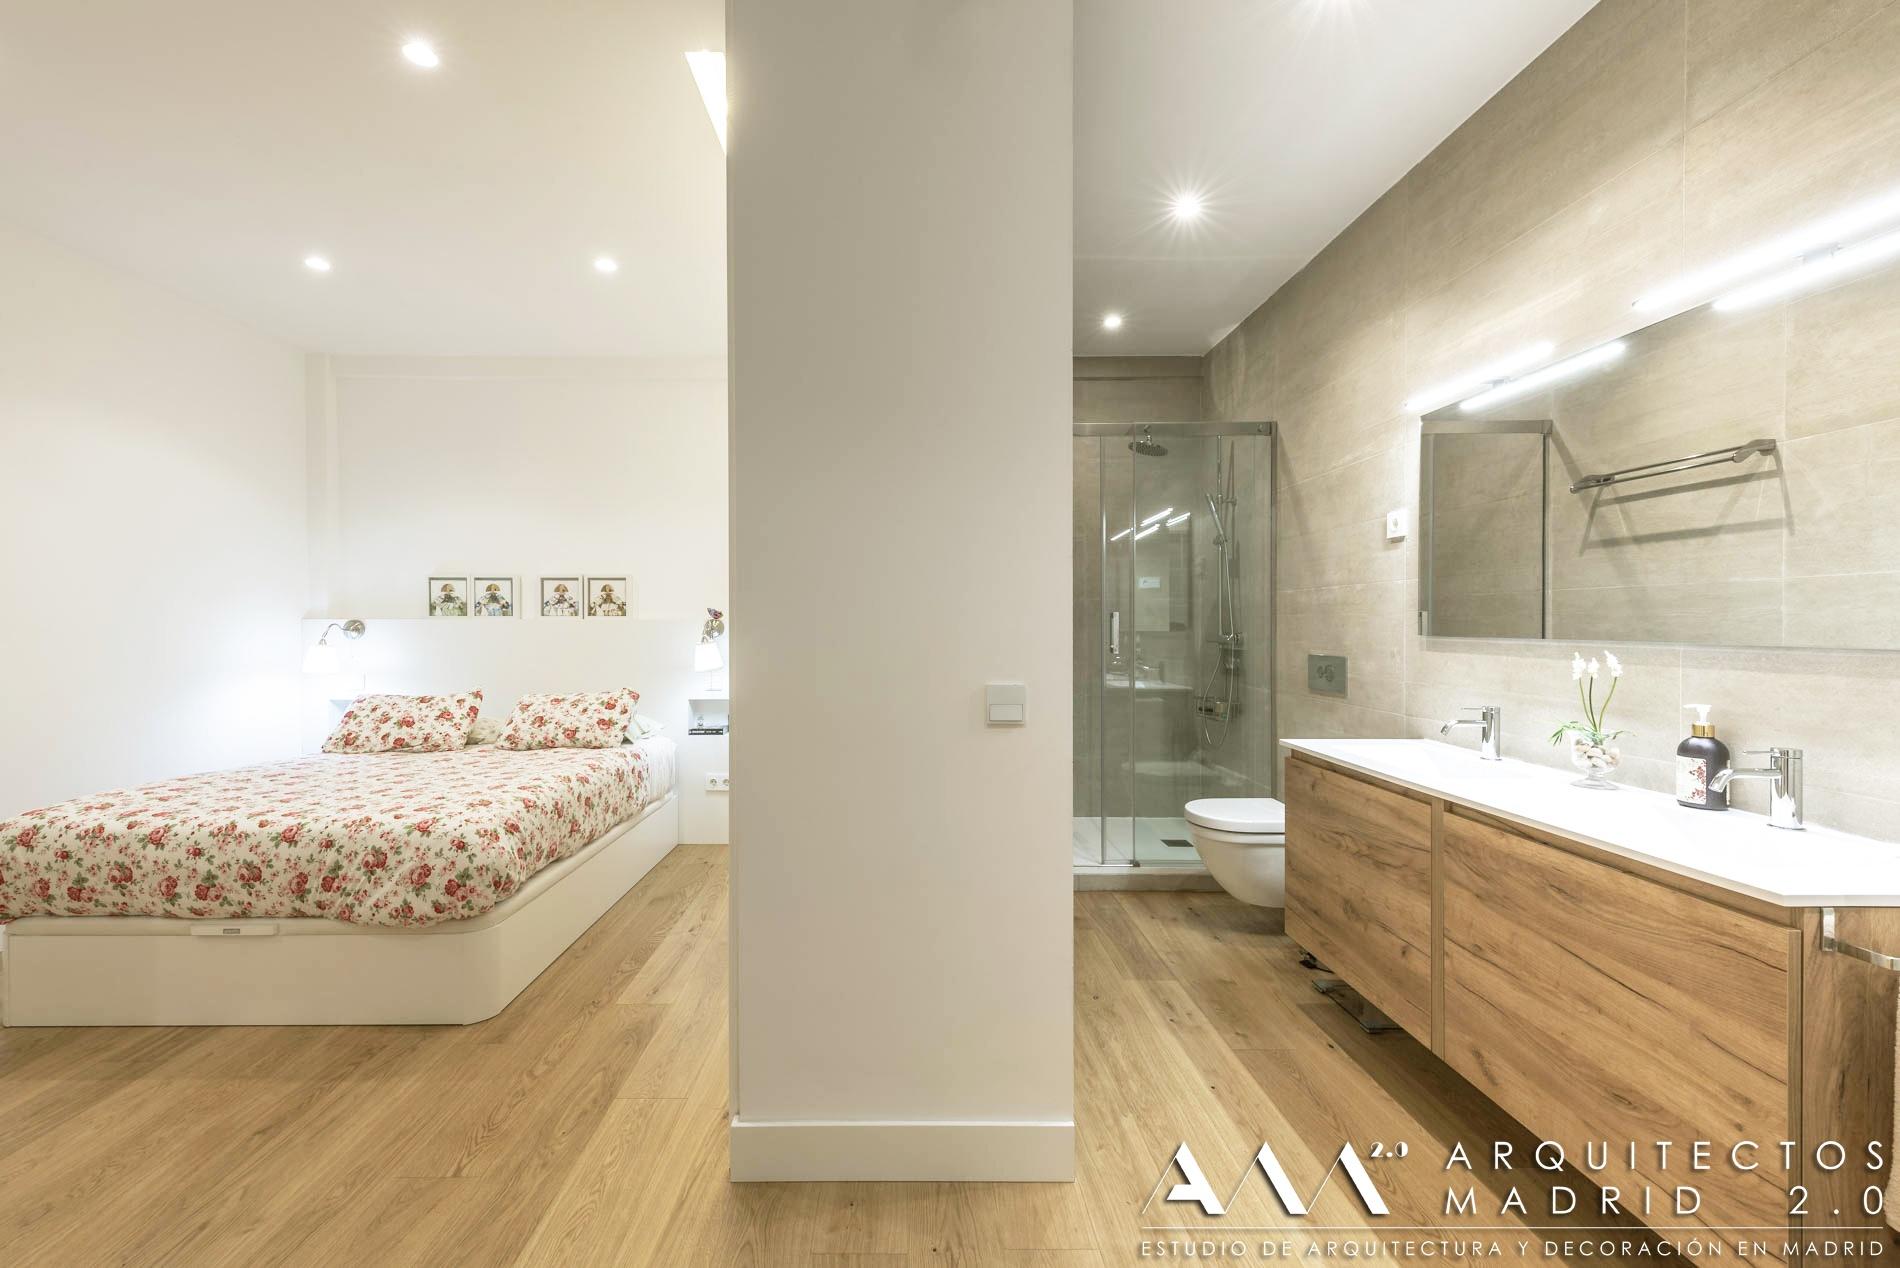 tarima-madera-natural-pavimento-continuo-entre-dormitorio-bano-sin-juntas